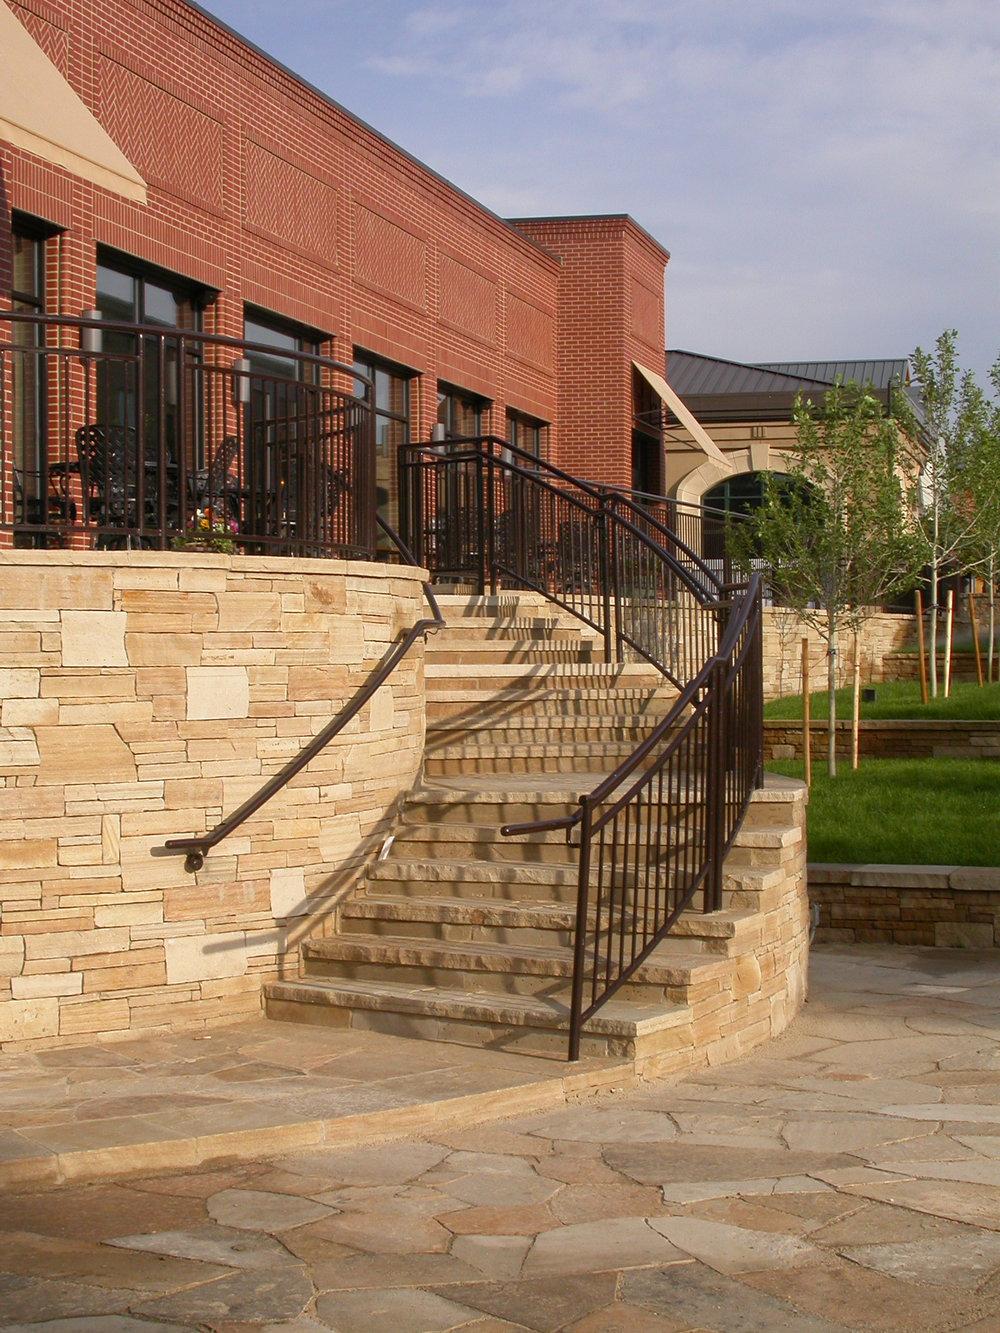 "<img src=""studioINSITE_Village_at_Castle_Pines-3""alt=""Shopping District_CastlePines_Colorado_Shopping_Mall_Streetscape_Urban Design_Landscape Architecture_Streetscape""title=""Village at Castle Pines""/>"